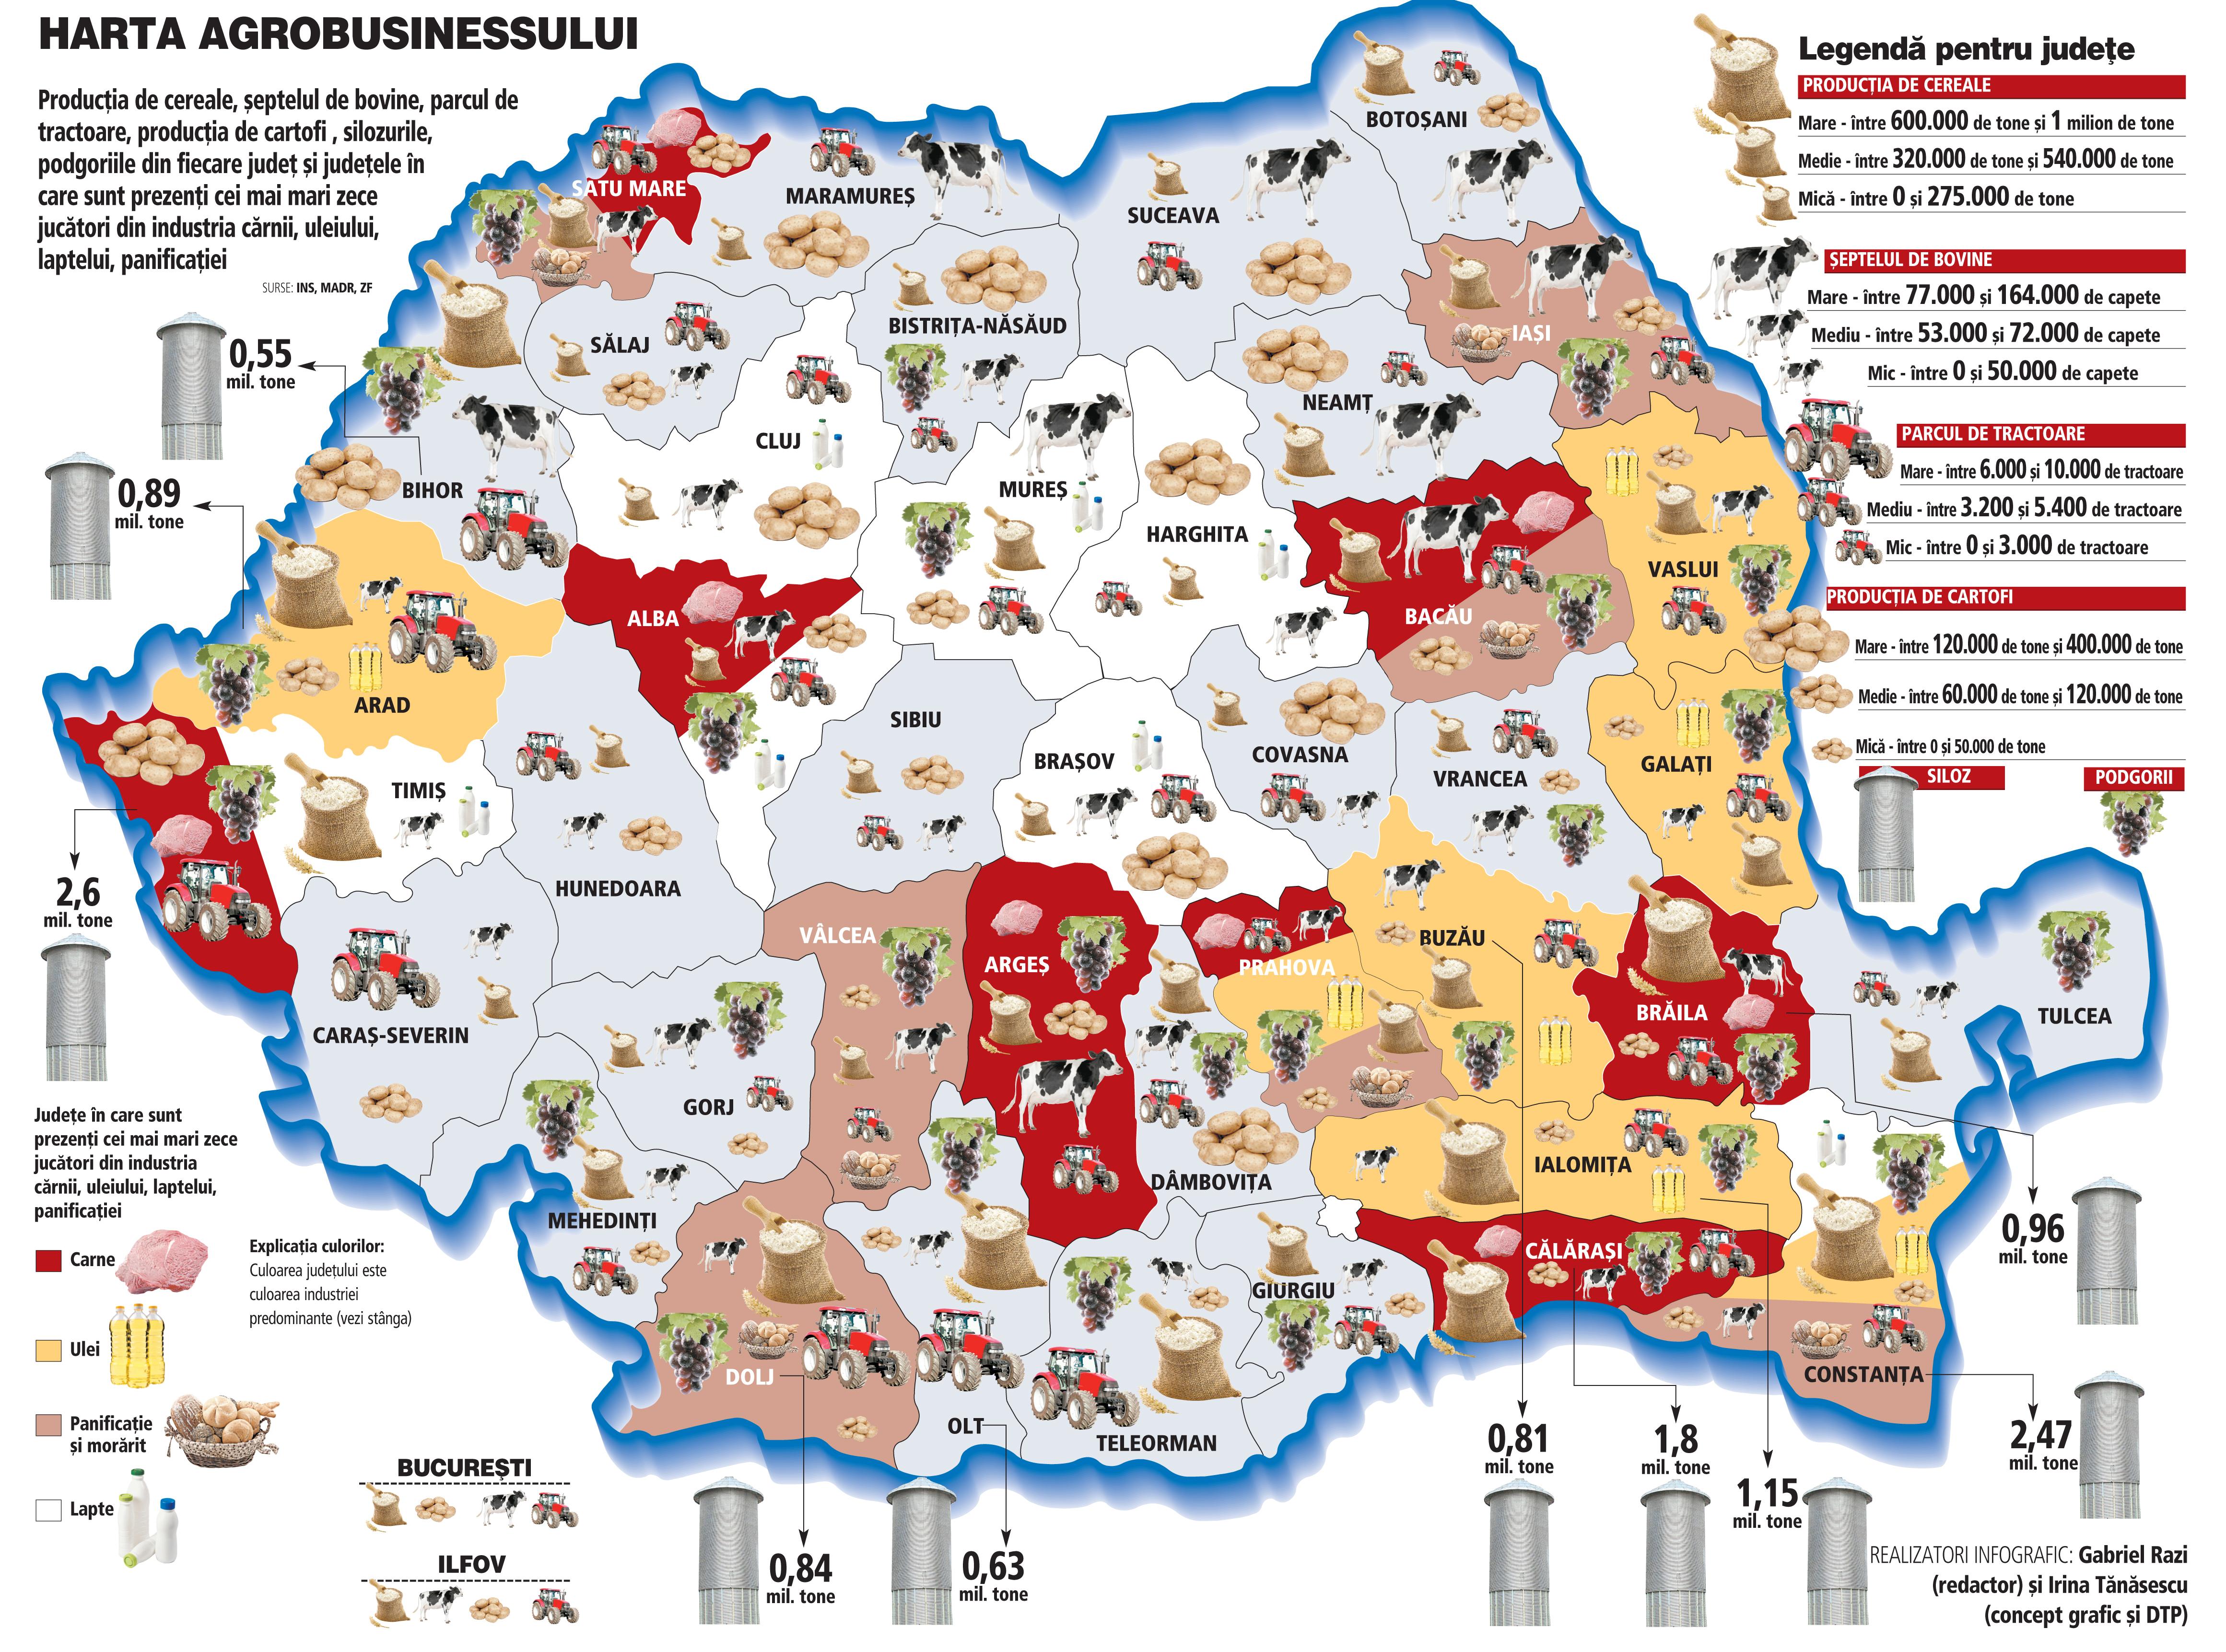 Harta agrobusinessului